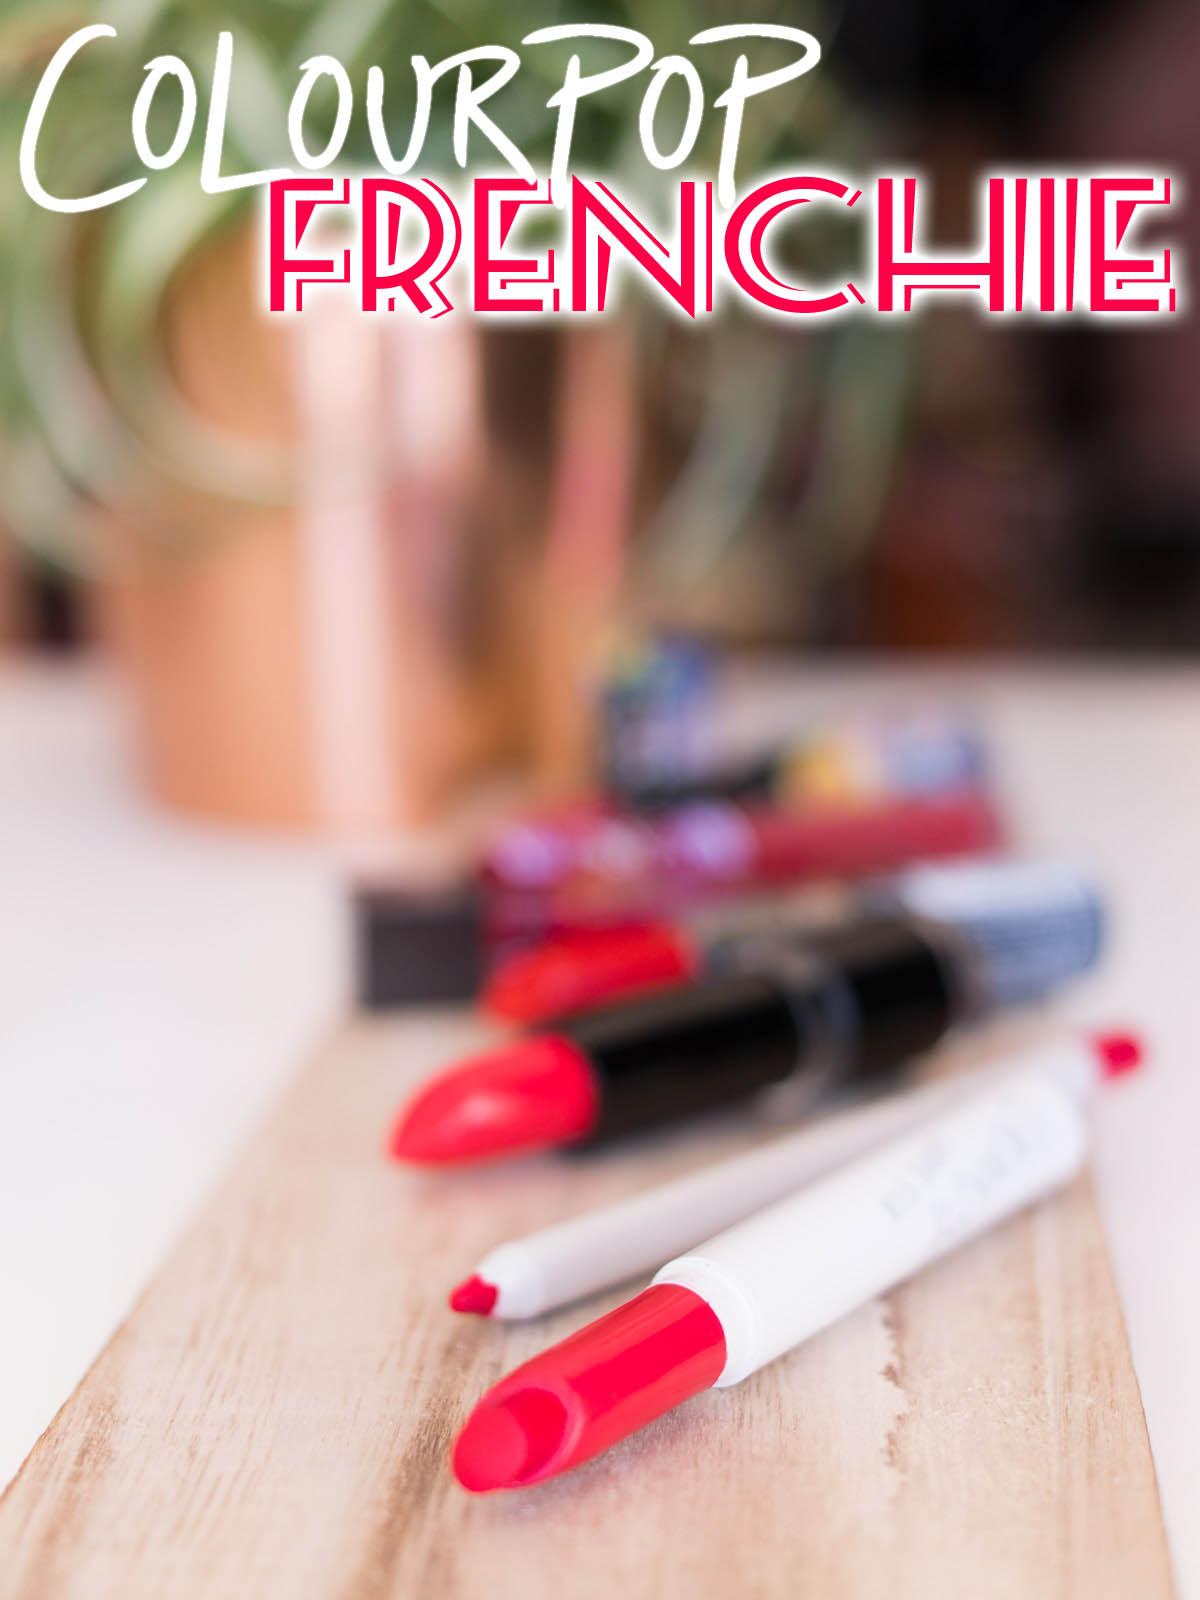 COLOURPOP Frenchie Lippie Stix Pencil Swatches Review Dupes 16